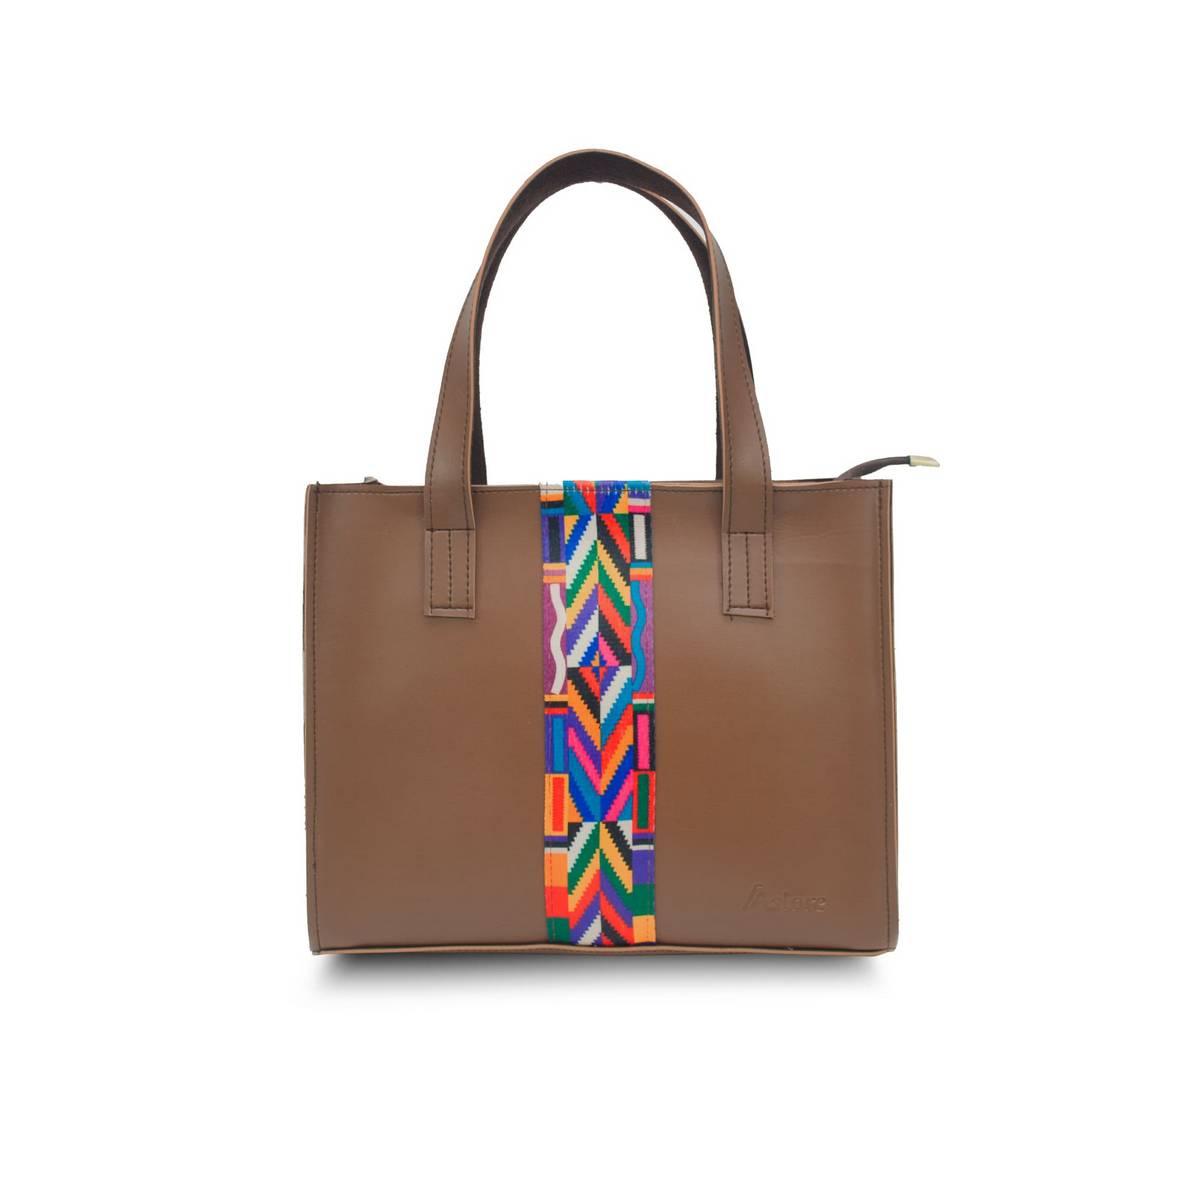 Astore Brown Double Compartments Vegan Leather Colorful Aztec Strip Casual Hand Bag Shoulder Bag Cross Body Bag Handle Bag